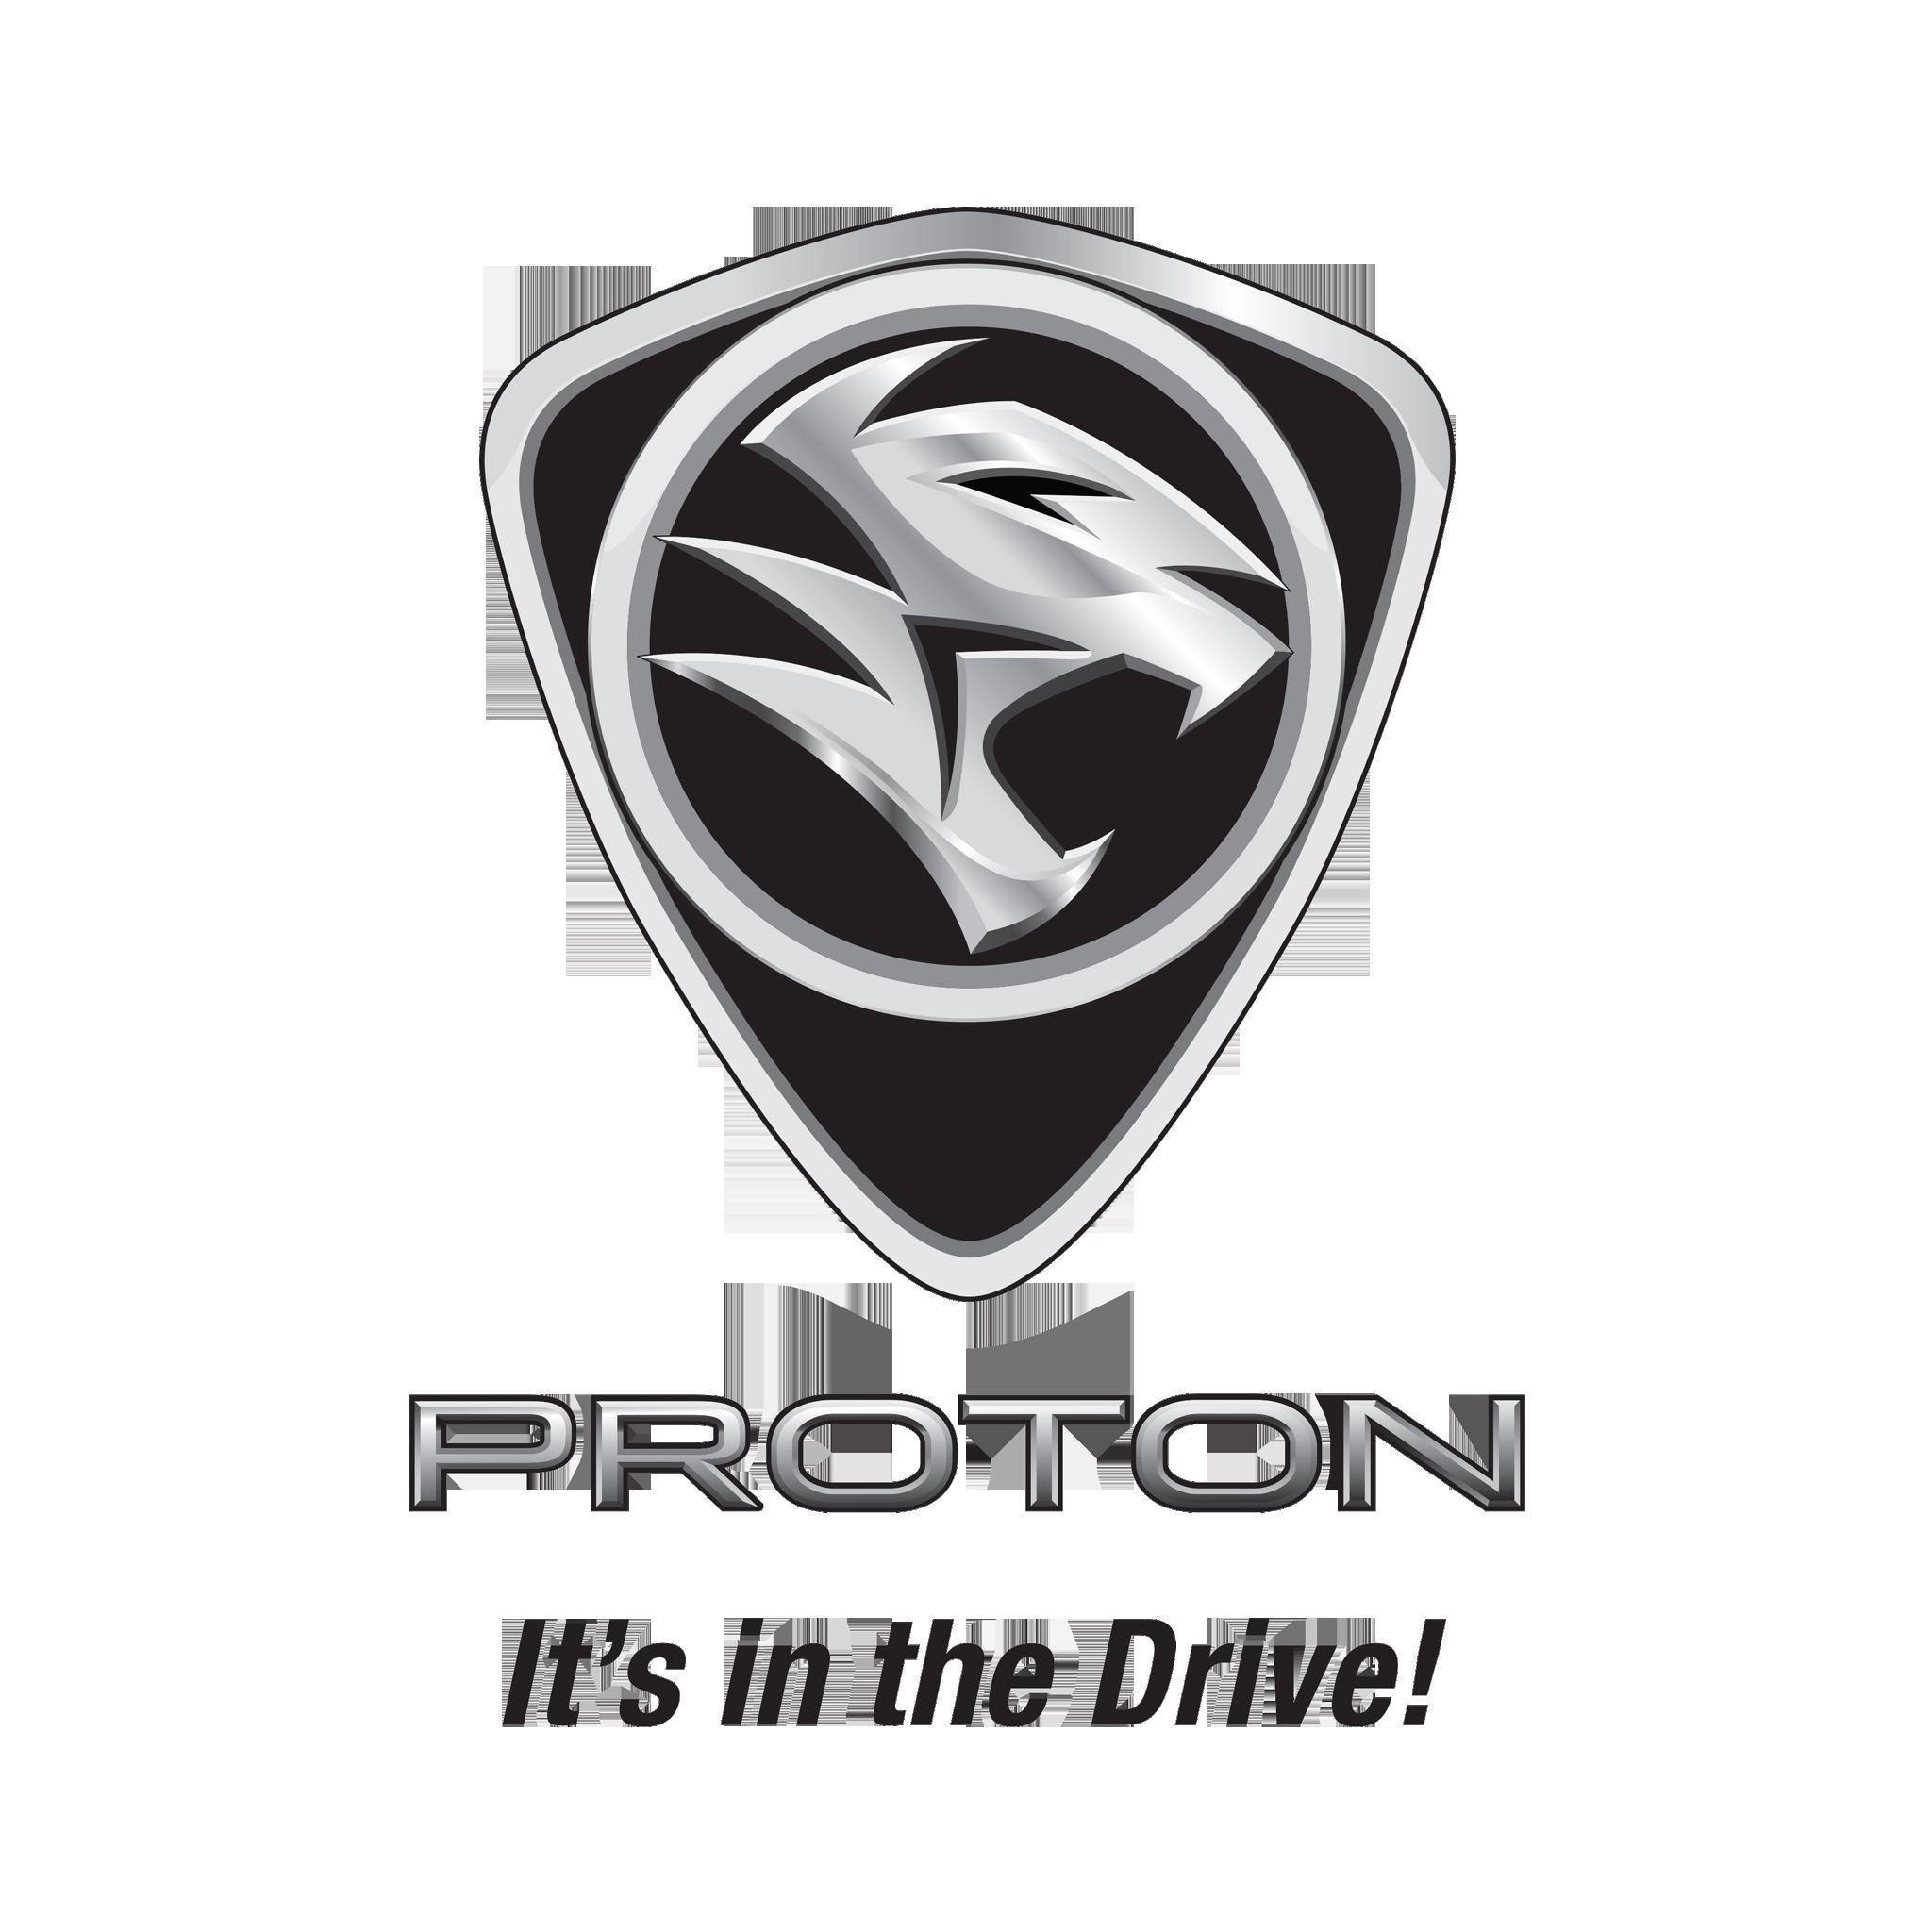 Proton Logo (2016-Present) 2048x2048 HD Png - New PNG HD